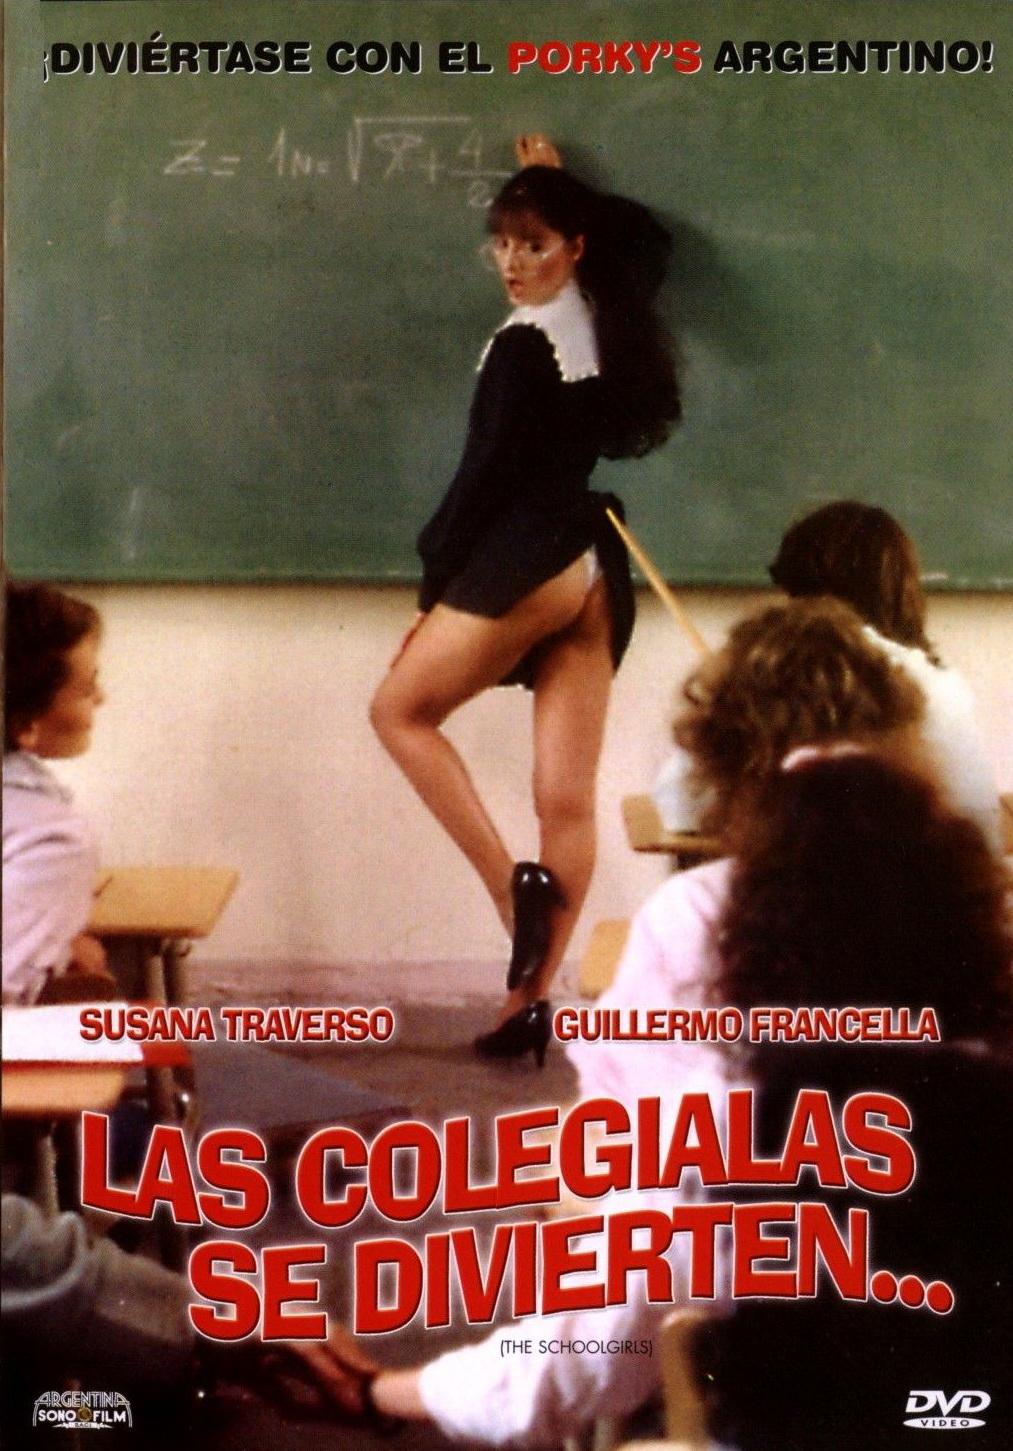 Las Colegialas Se Divierten (1986)Full Movie Online